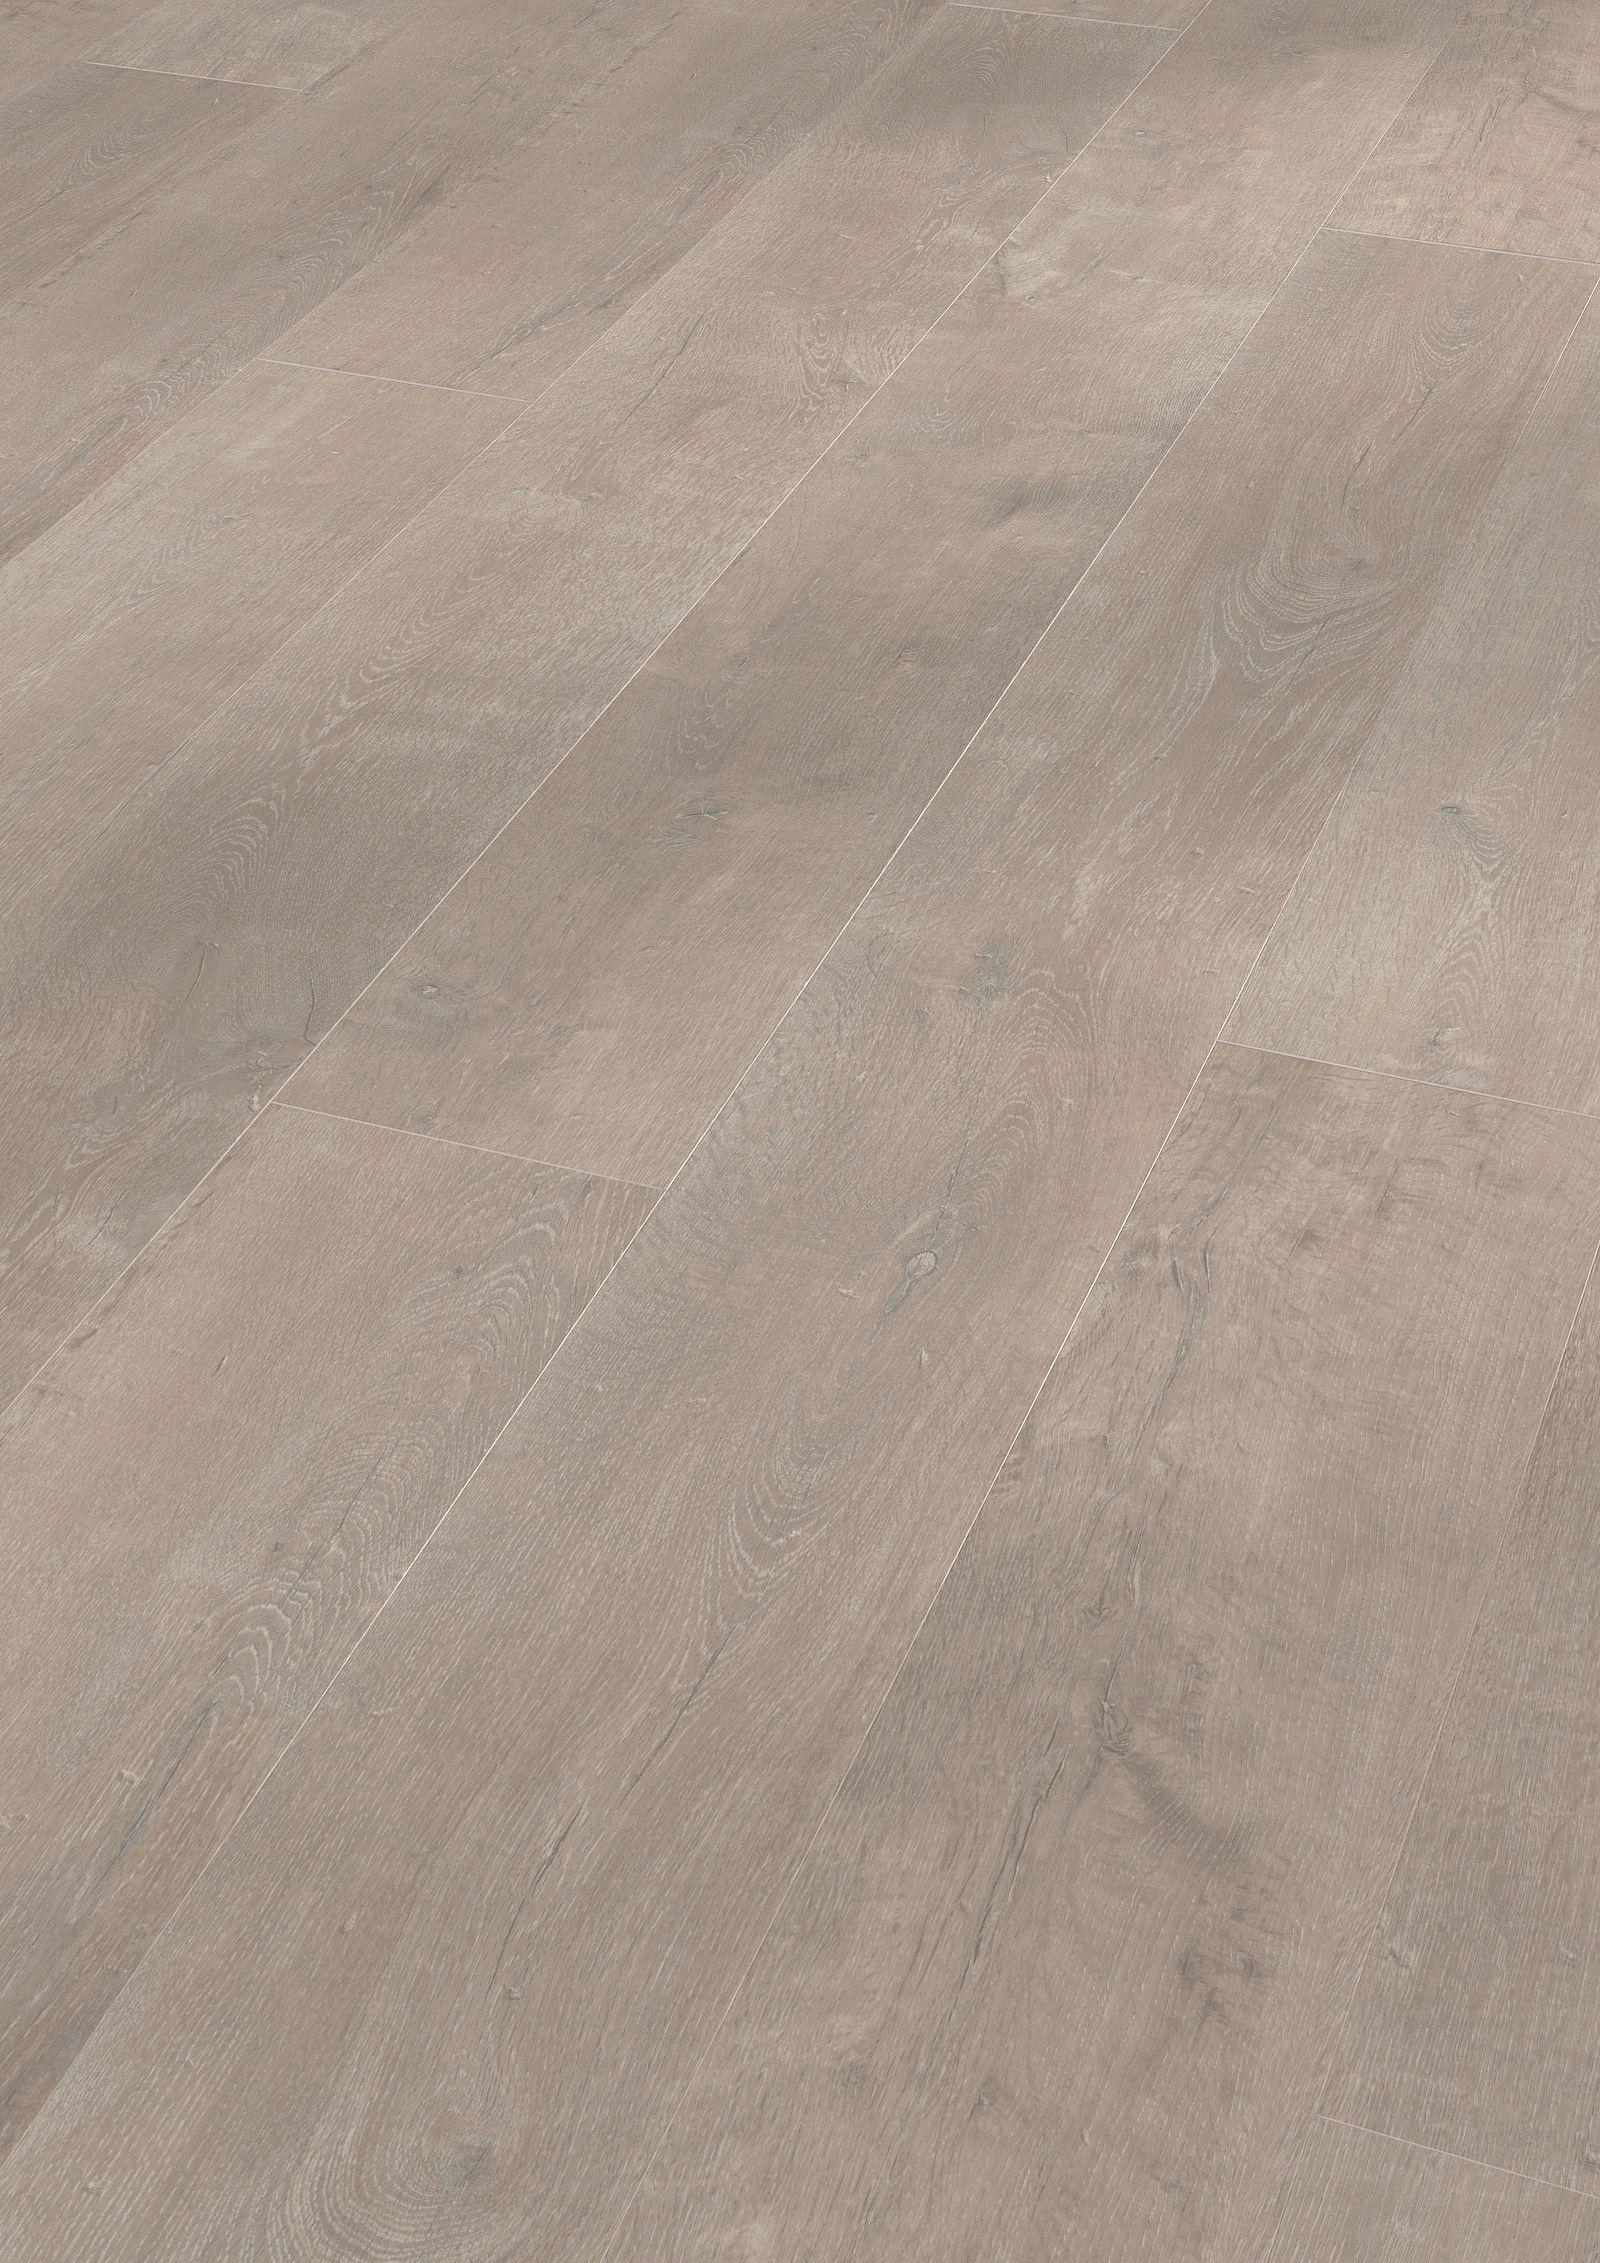 Design Flooring Catega Flex Silent Touch Click System